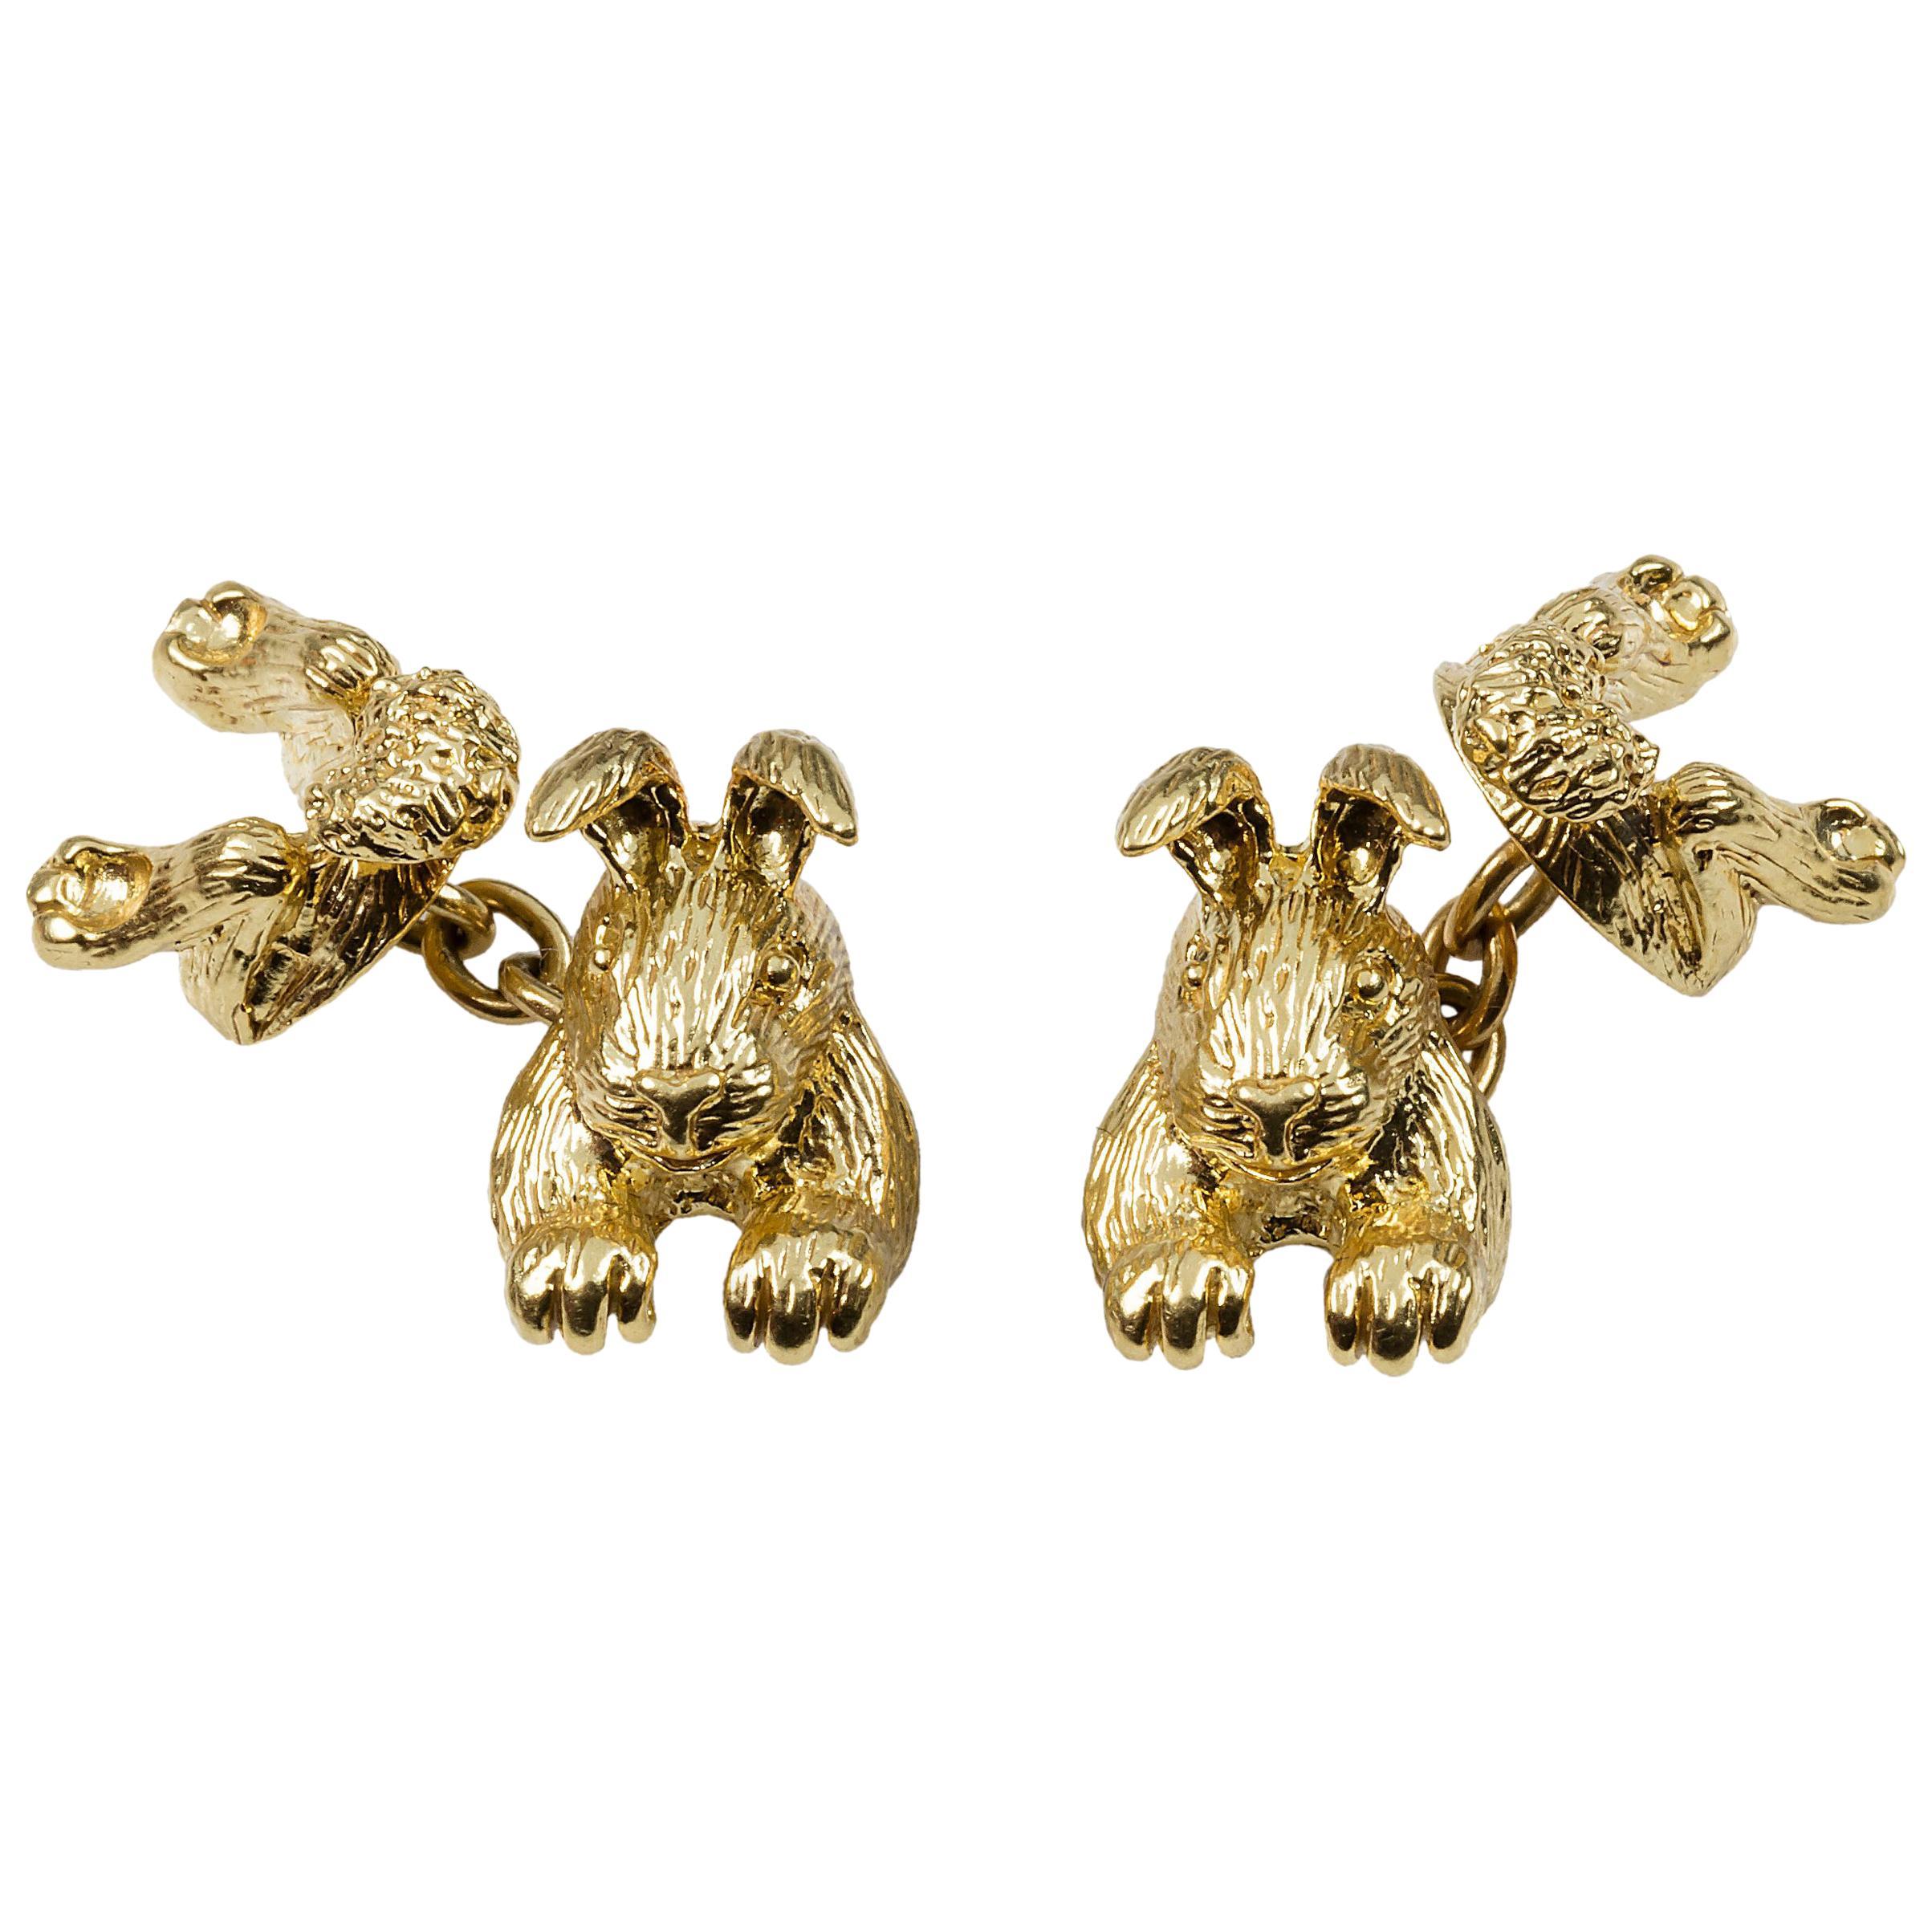 18 Karat Yellow Gold Rabbit Cufflinks